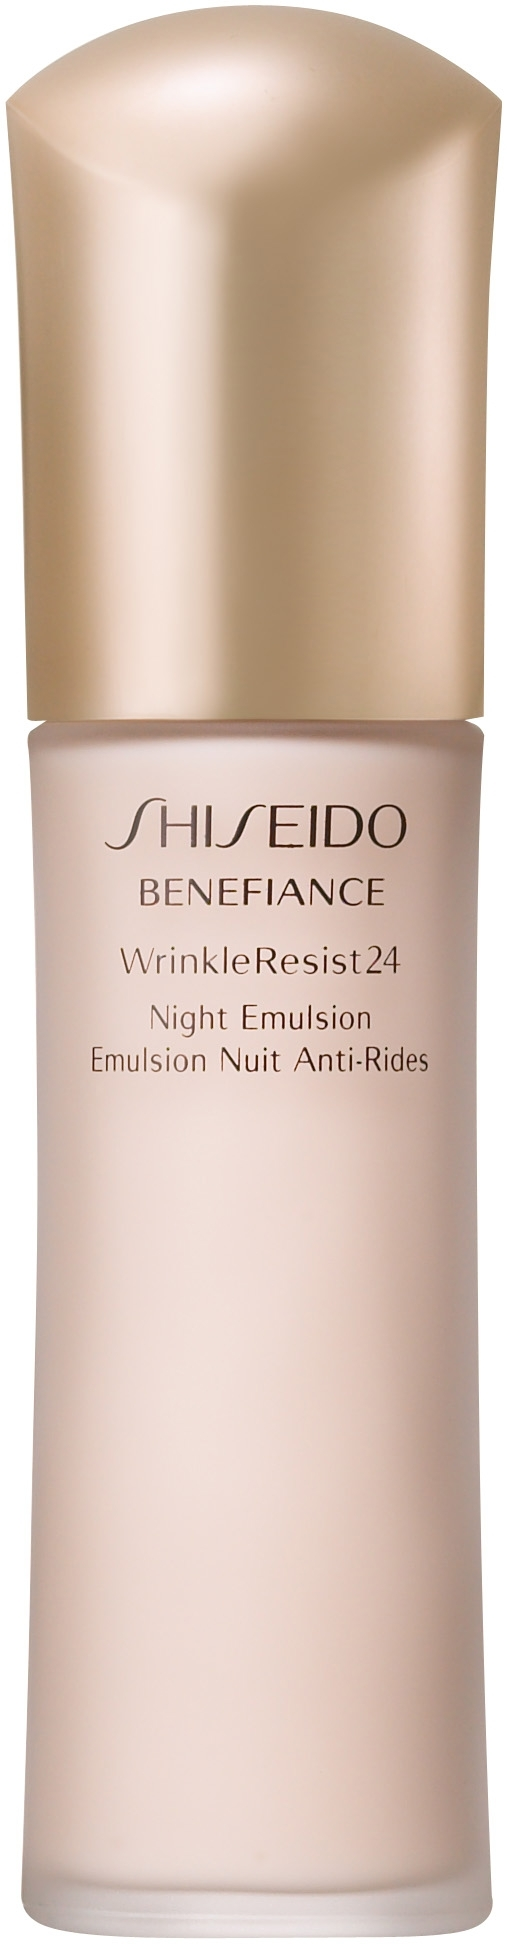 shiseido wrinkle resist 24 nigth emulsion 75ml compra en perfumer as laguna. Black Bedroom Furniture Sets. Home Design Ideas